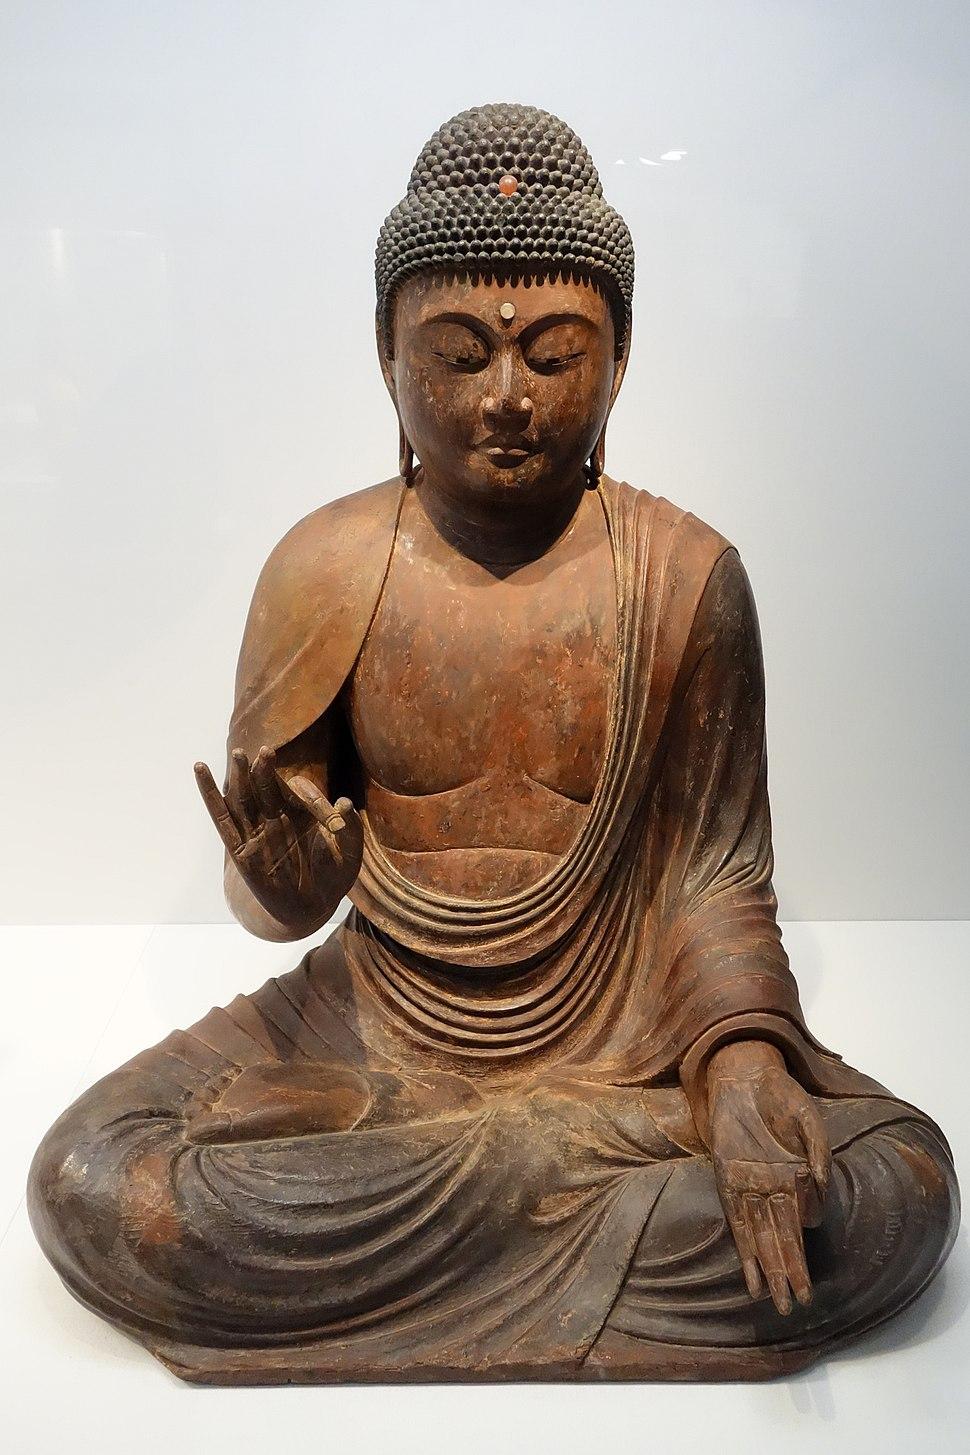 Seated Amida Nyorai (Amitabha), Kamakura period, 12th-13th century, wood with gold leaf and inlaid crystal eyes - Tokyo National Museum - DSC05345